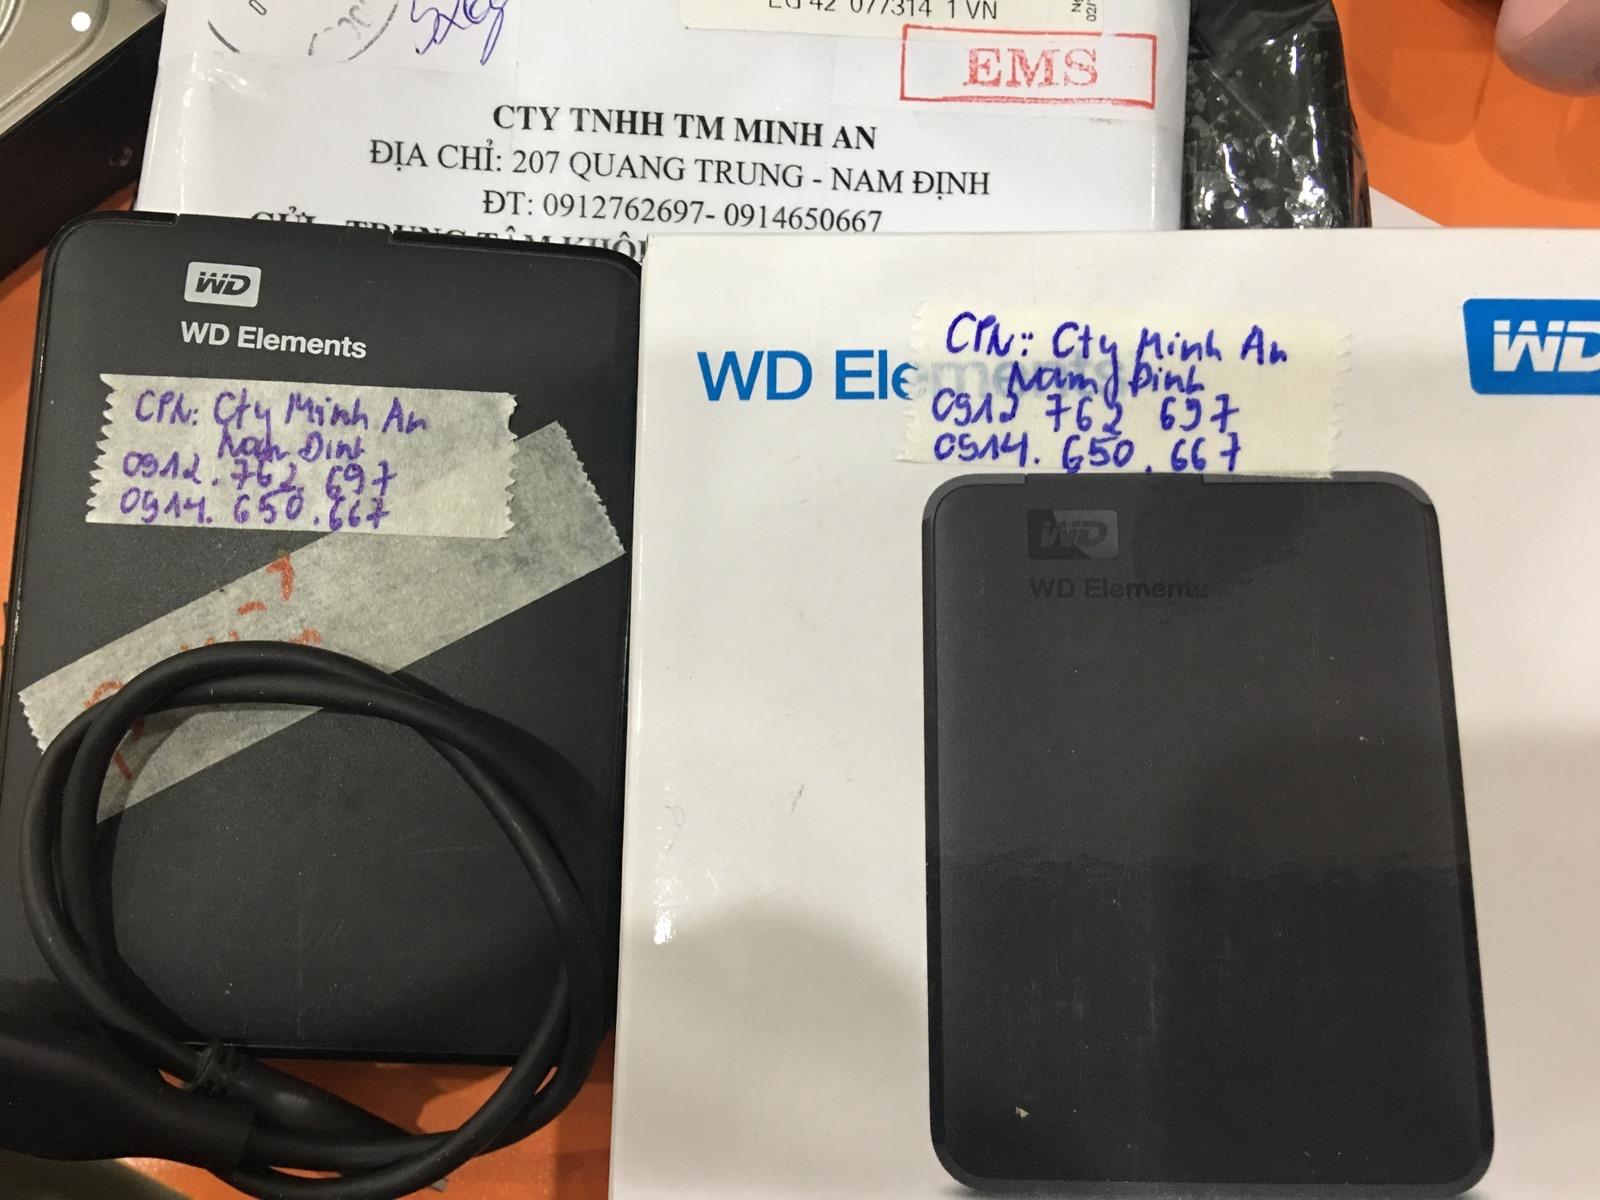 Phục hồi dữ liệu ổ cứng Western 1TB lỗi cơ 19/03/2020 - cuumaytinh